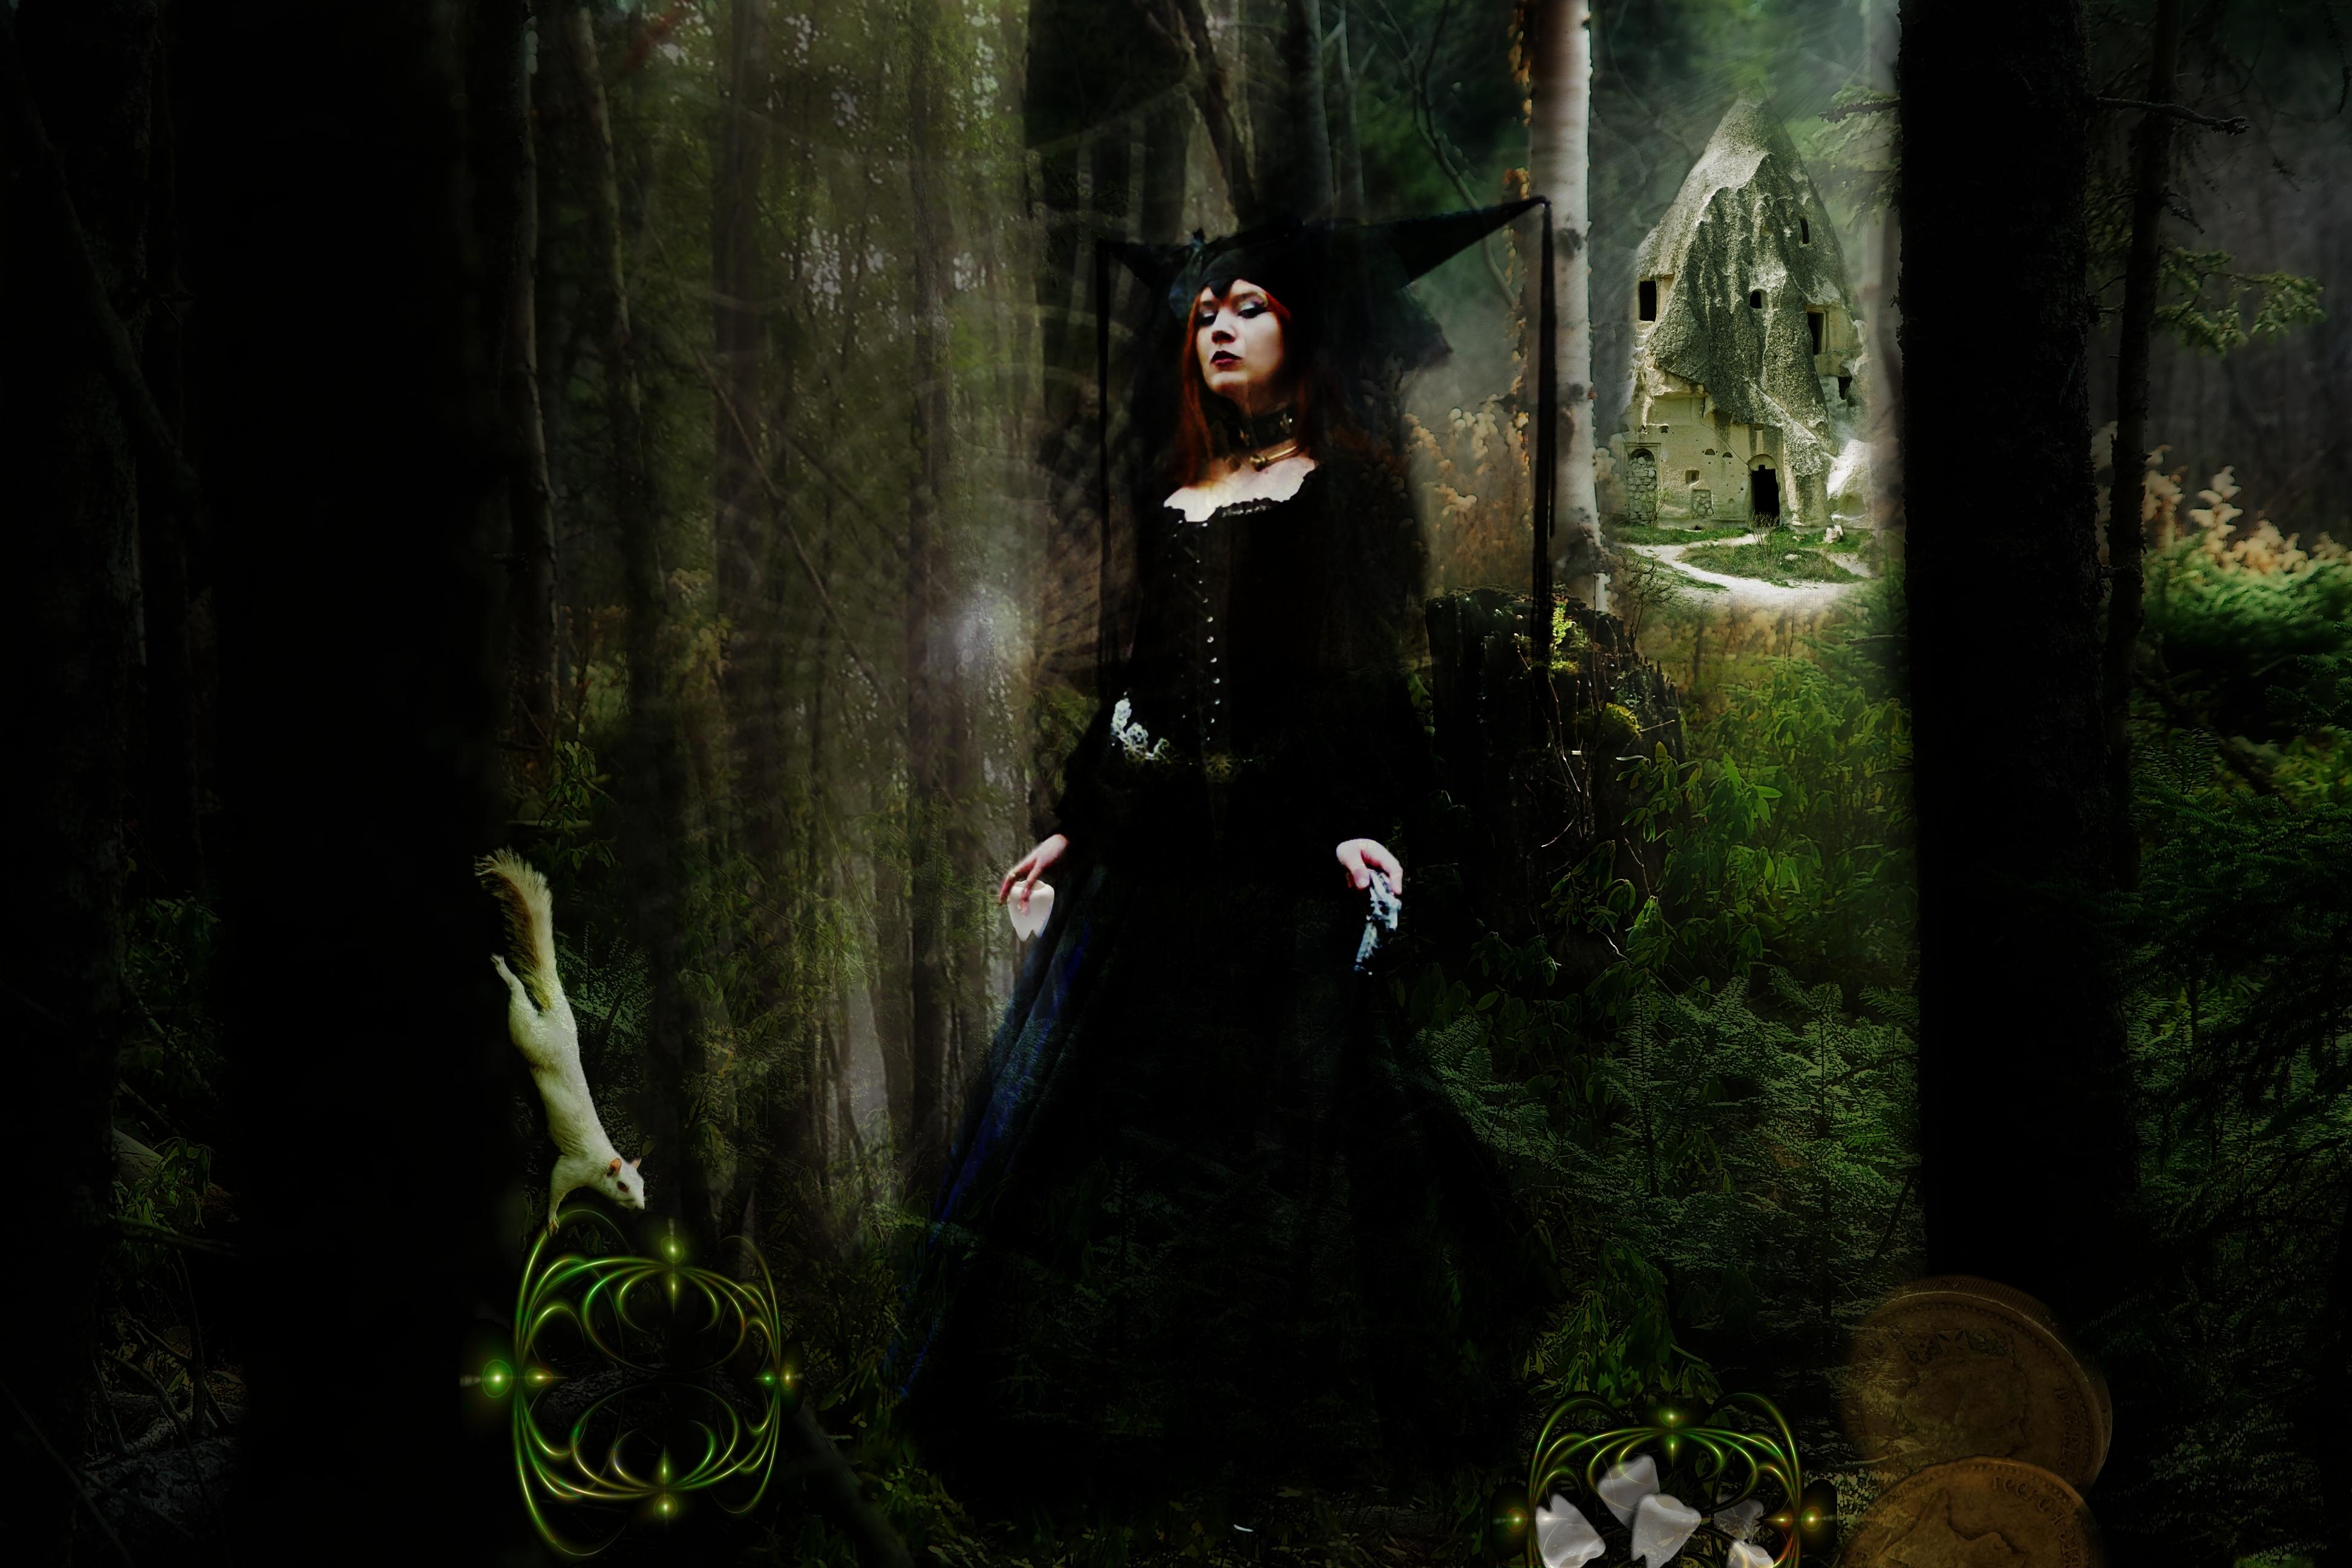 vampire fairy wallpaper backgrounds - photo #22